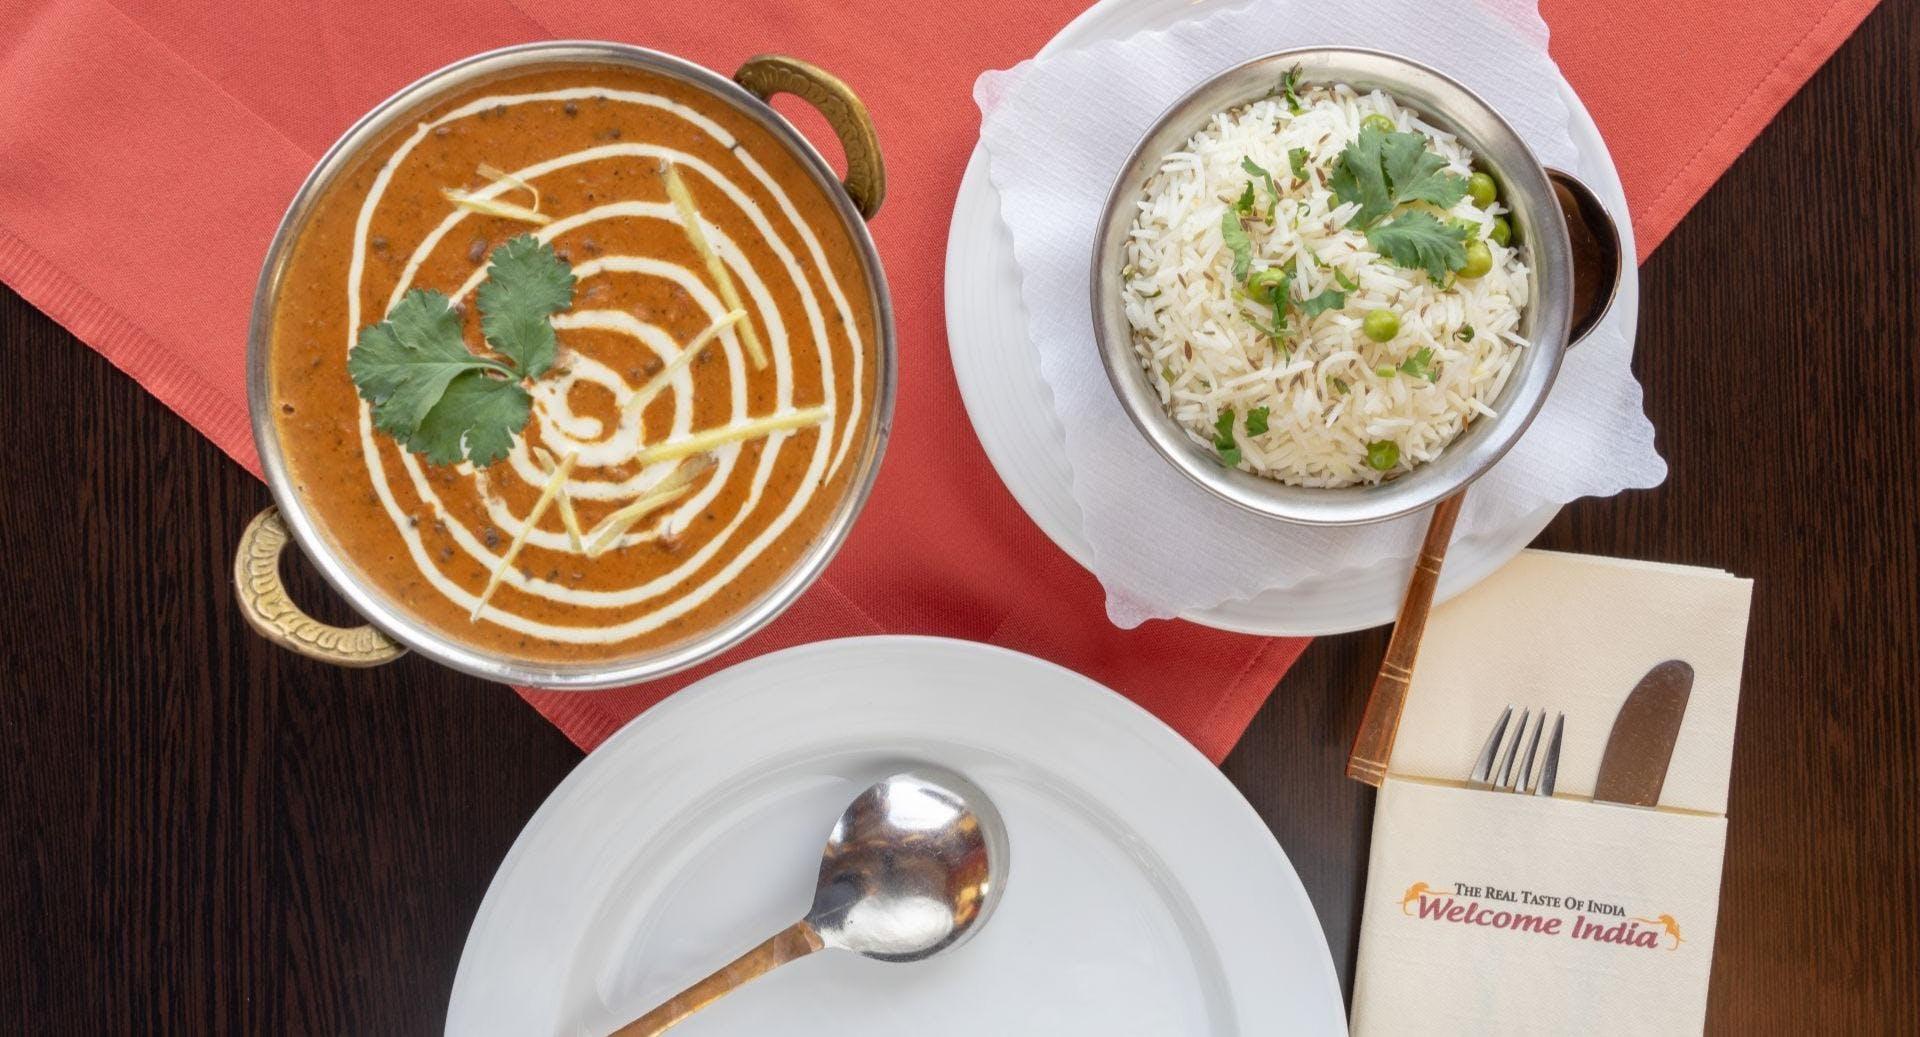 Welcome India Restaurant Hambourg image 2